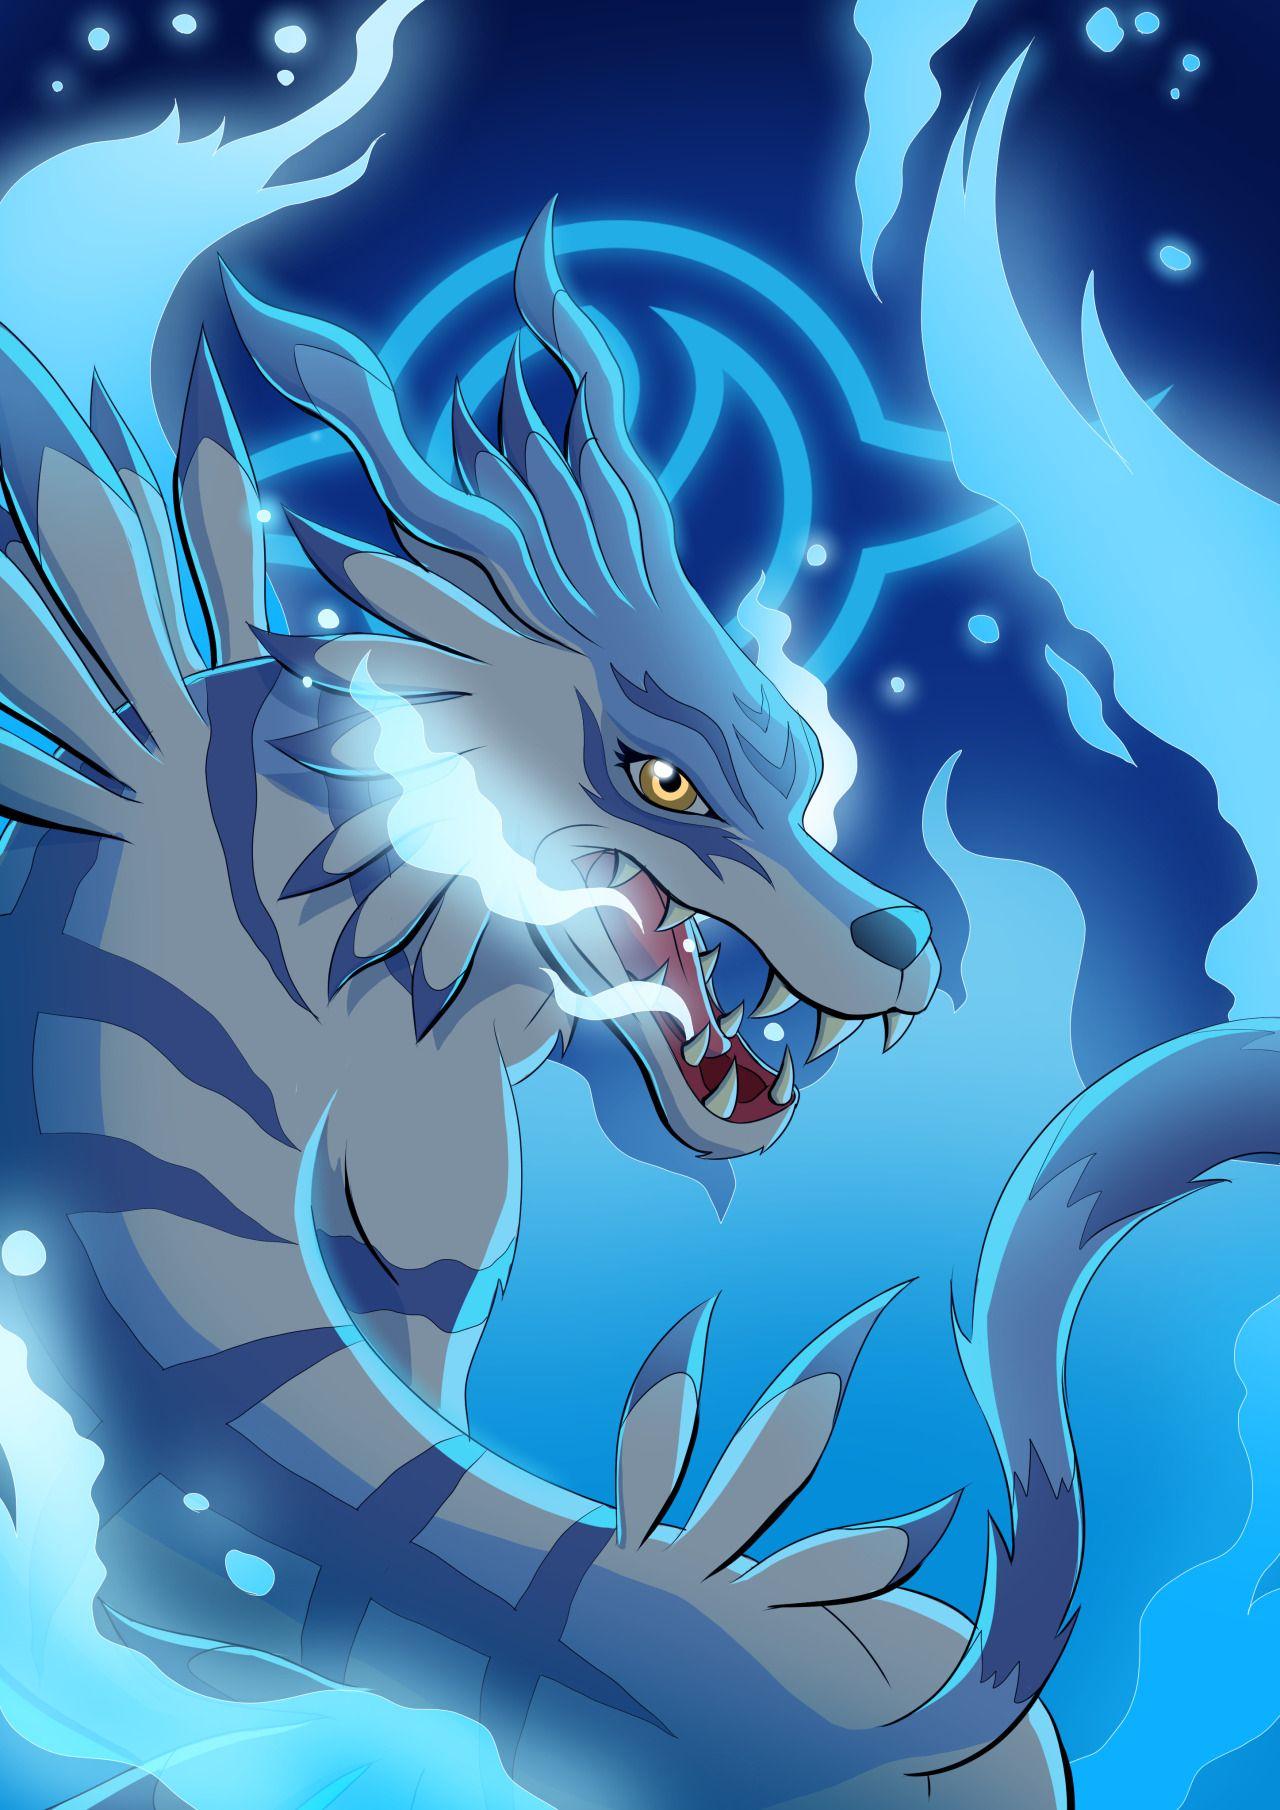 Wargreymon Wallpaper 3d Garurumon Digimon Adventure Digimon Wallpaper Digimon